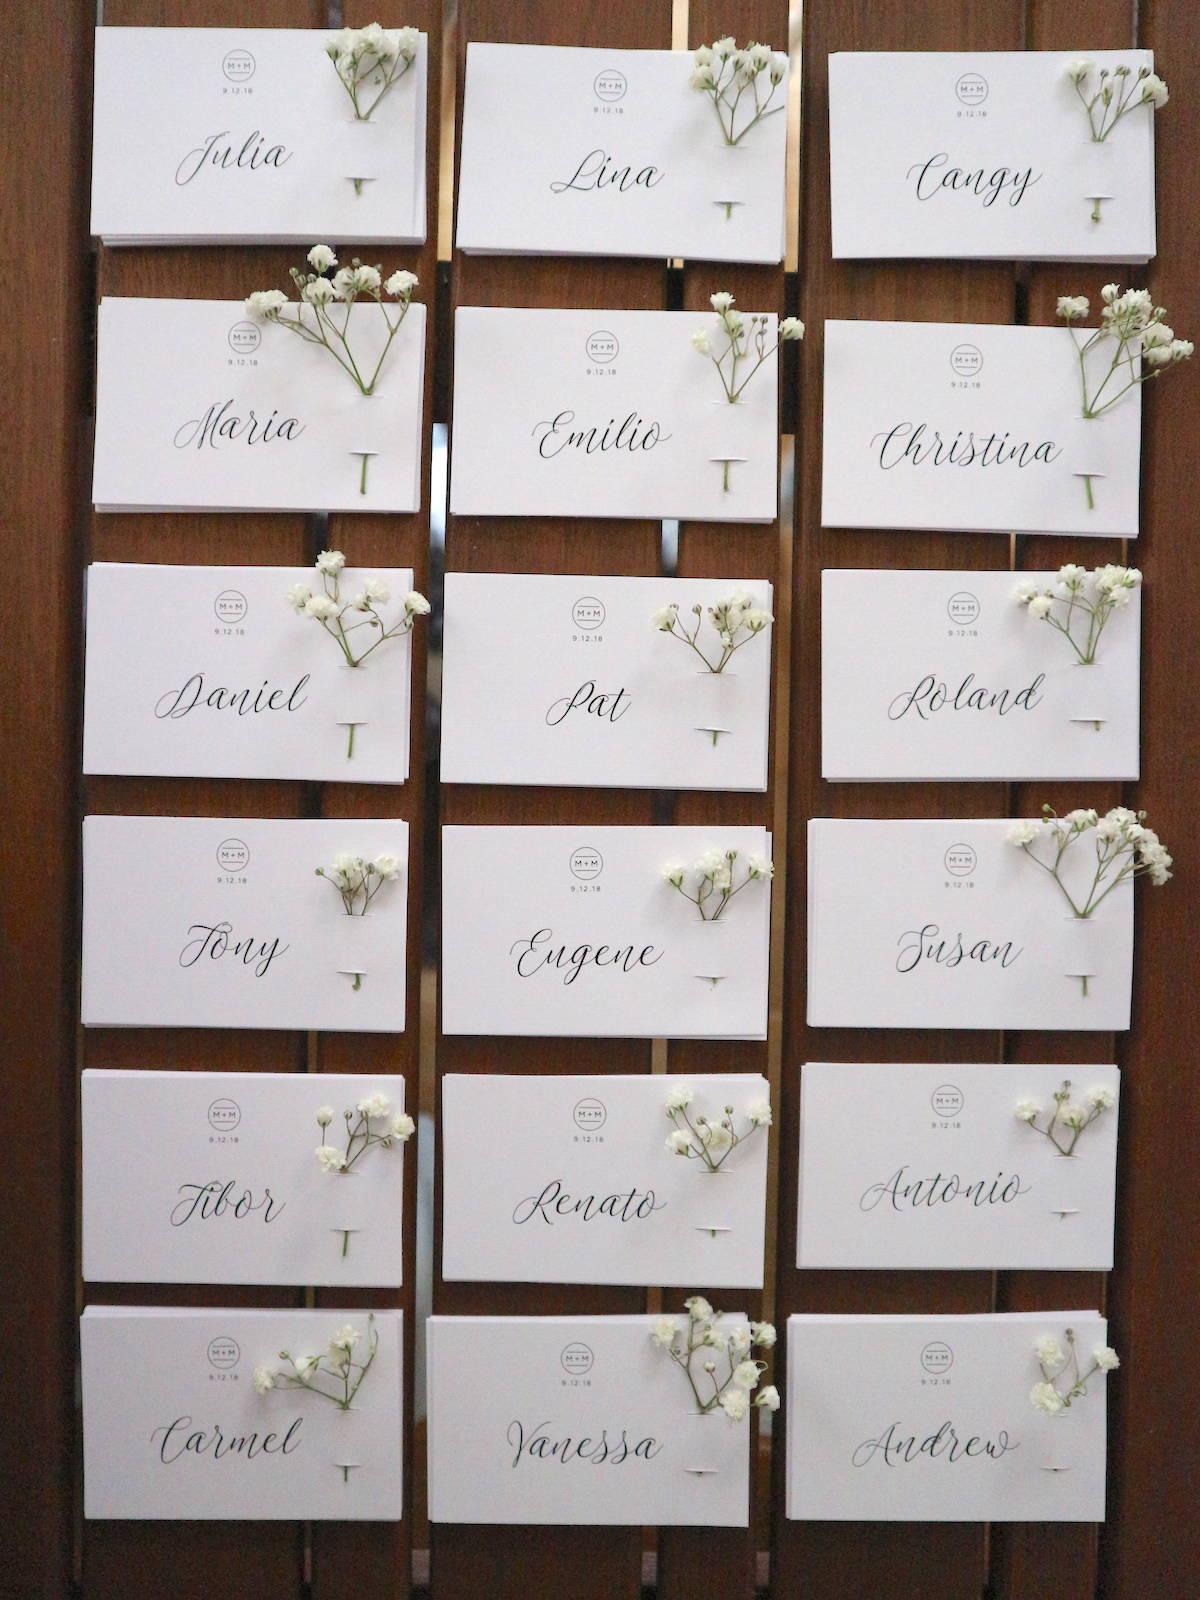 Flower Place Cards Tutorial | The Hello Bureau